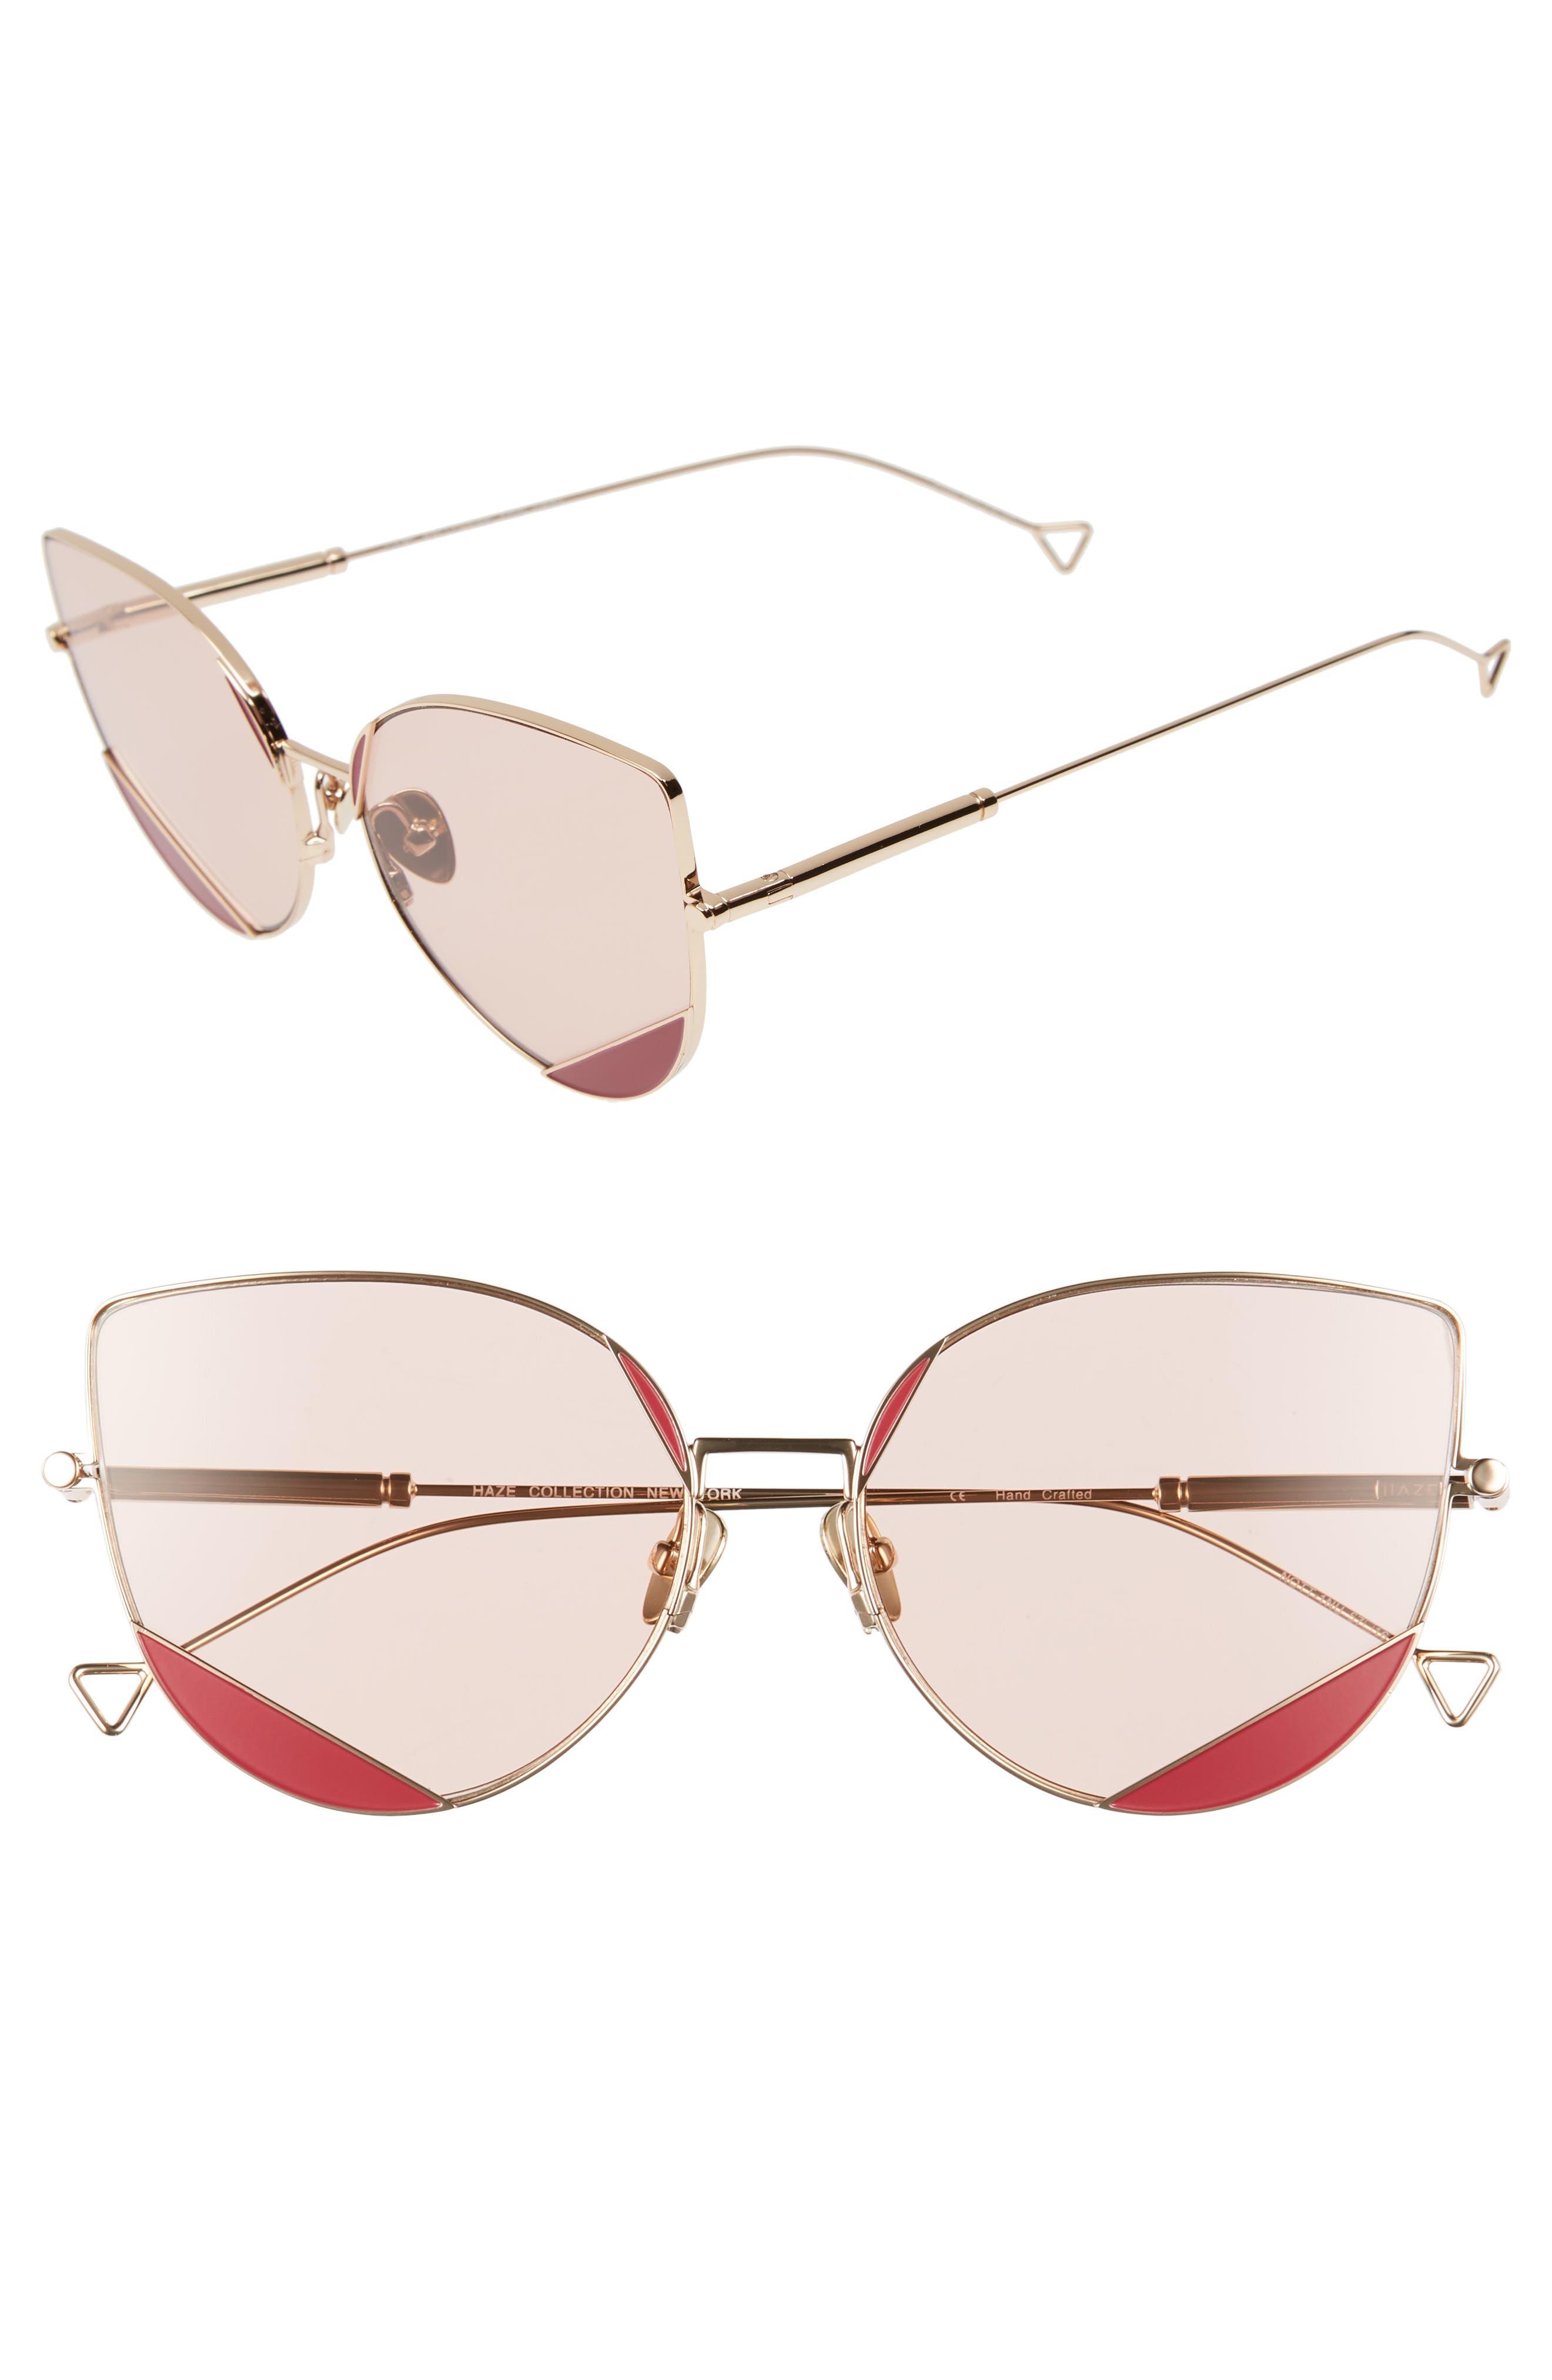 HAZE The Nott 57mm Sunglasses, Main, color, DEEP CLARET